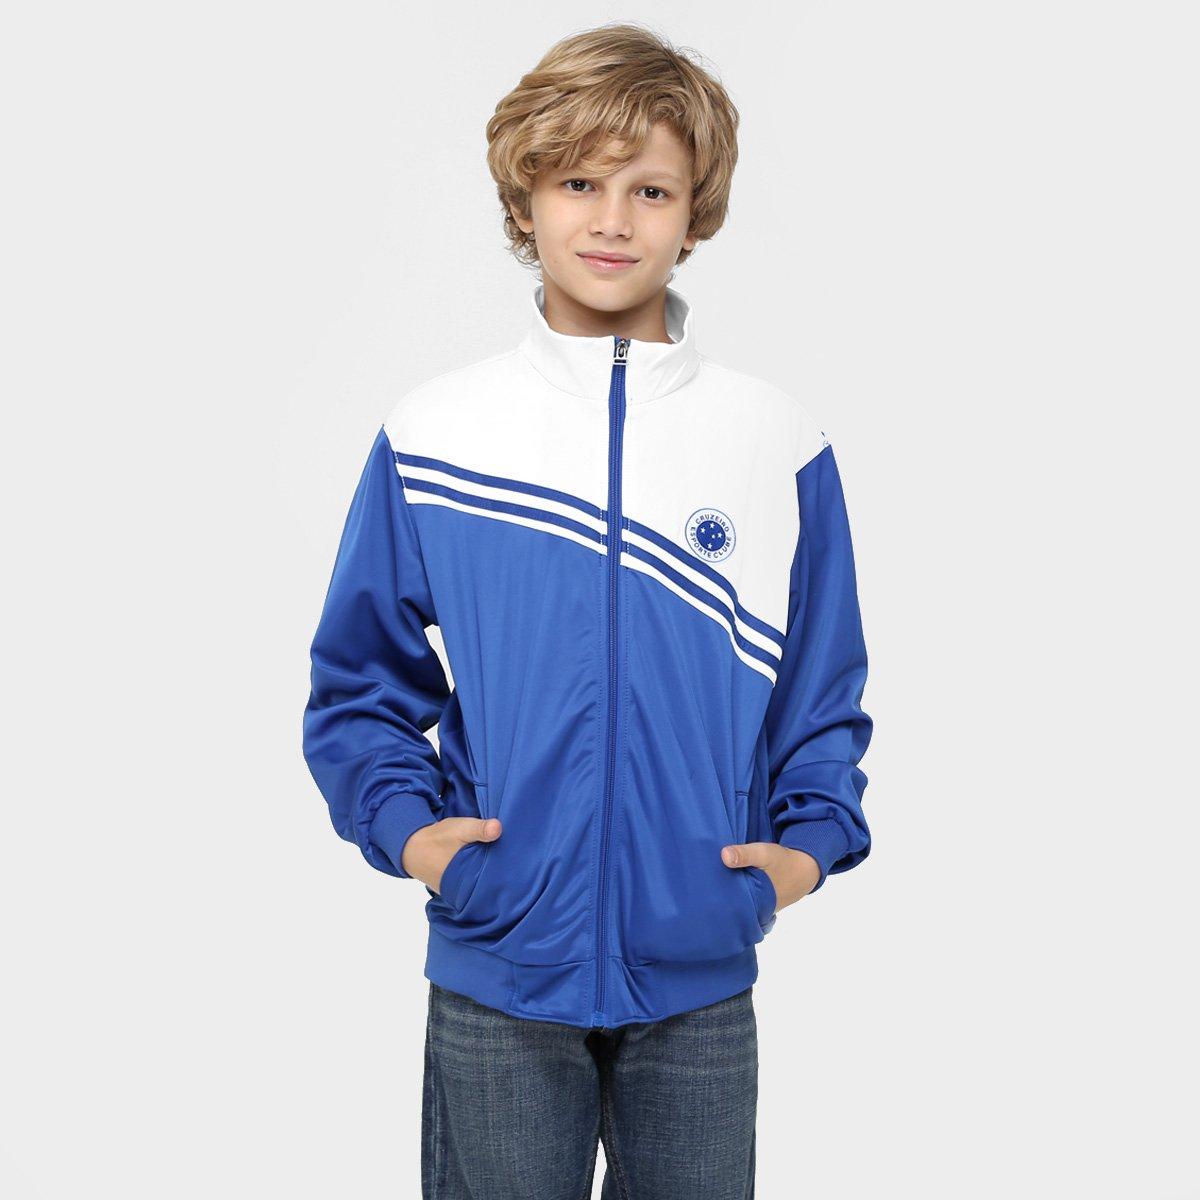 61b5931390eac Jaqueta Cruzeiro Juvenil - Compre Agora